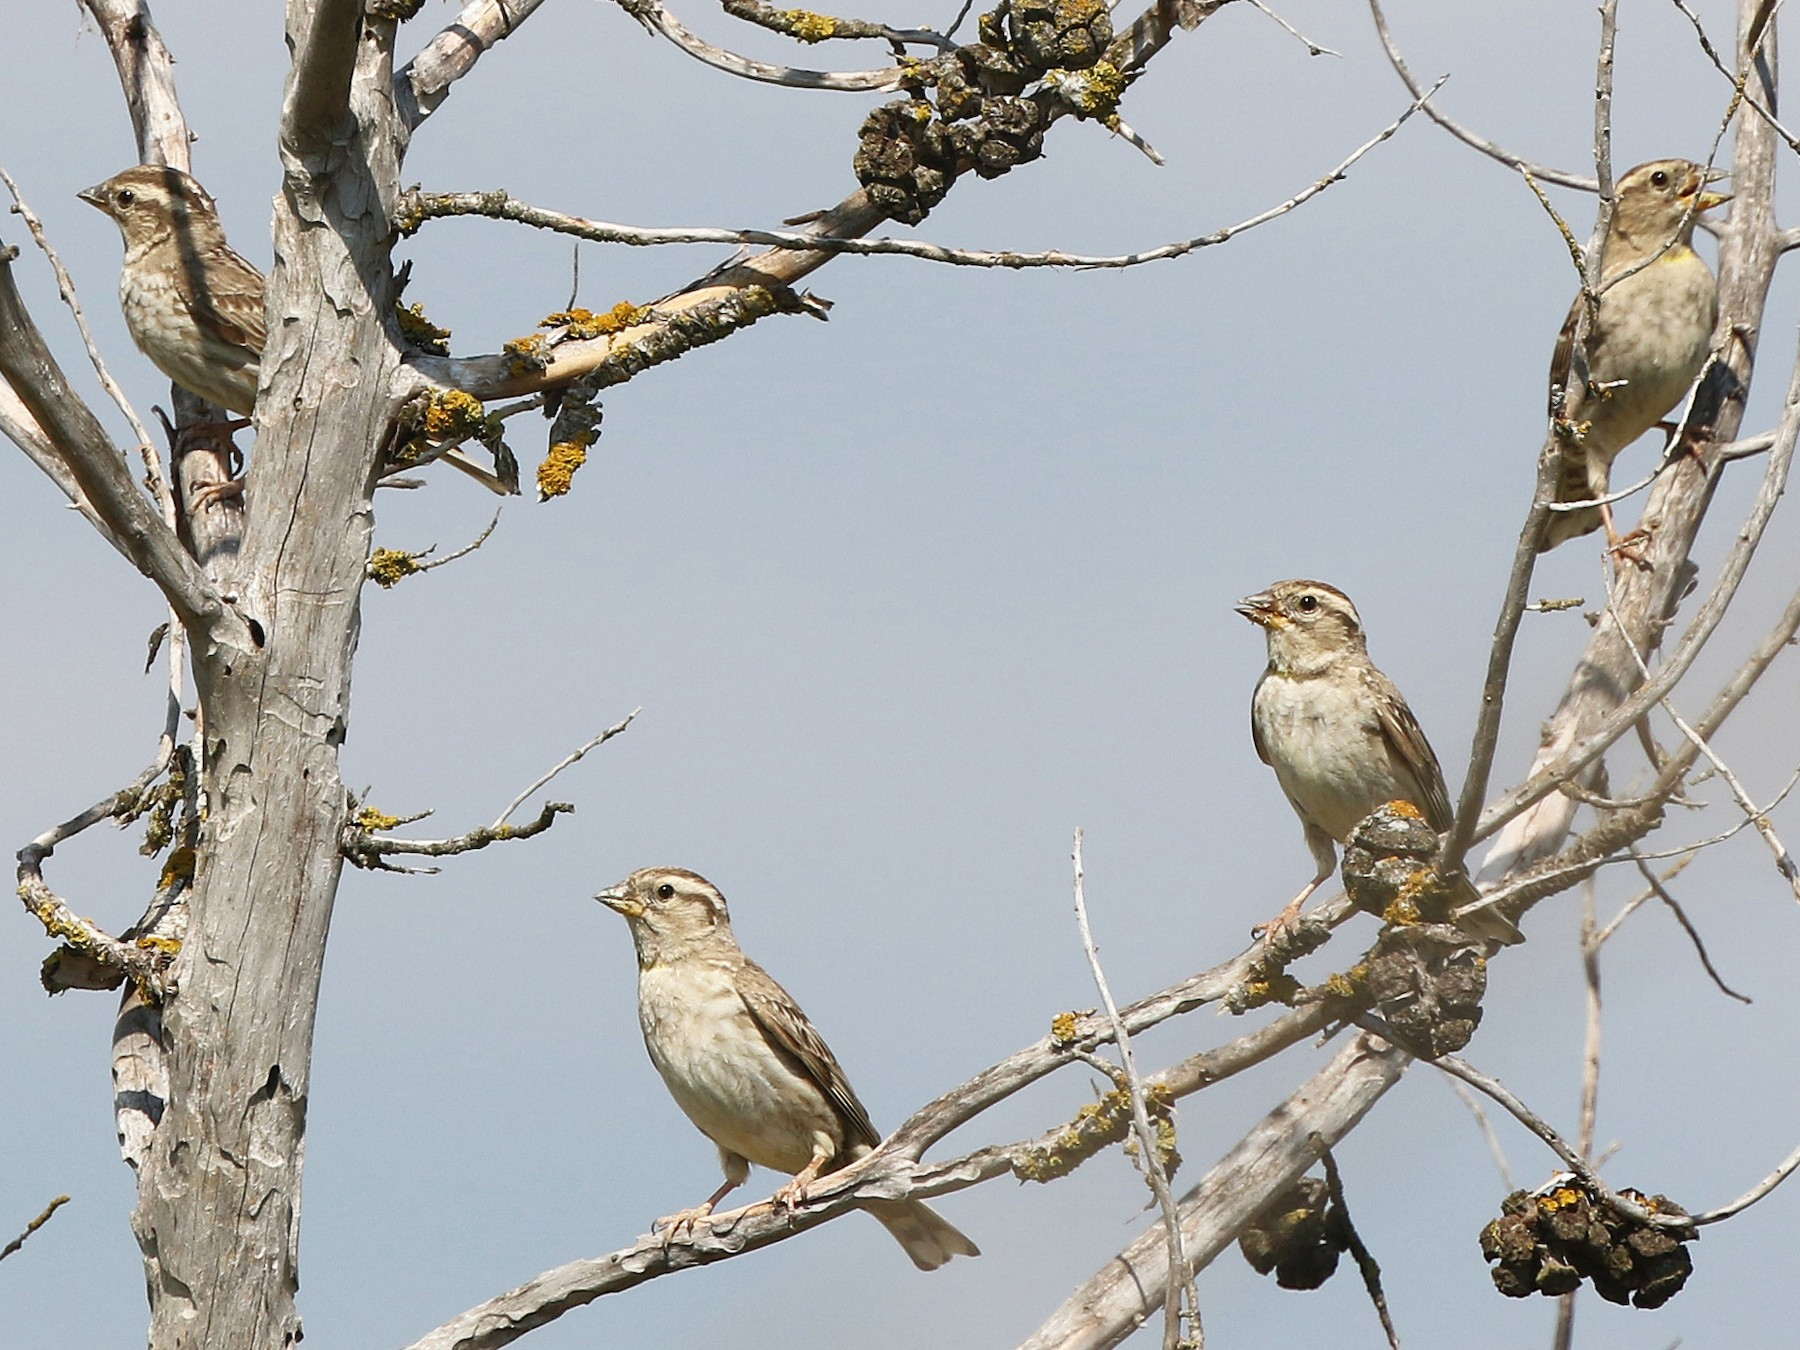 Rock Sparrow - Daniel Jauvin